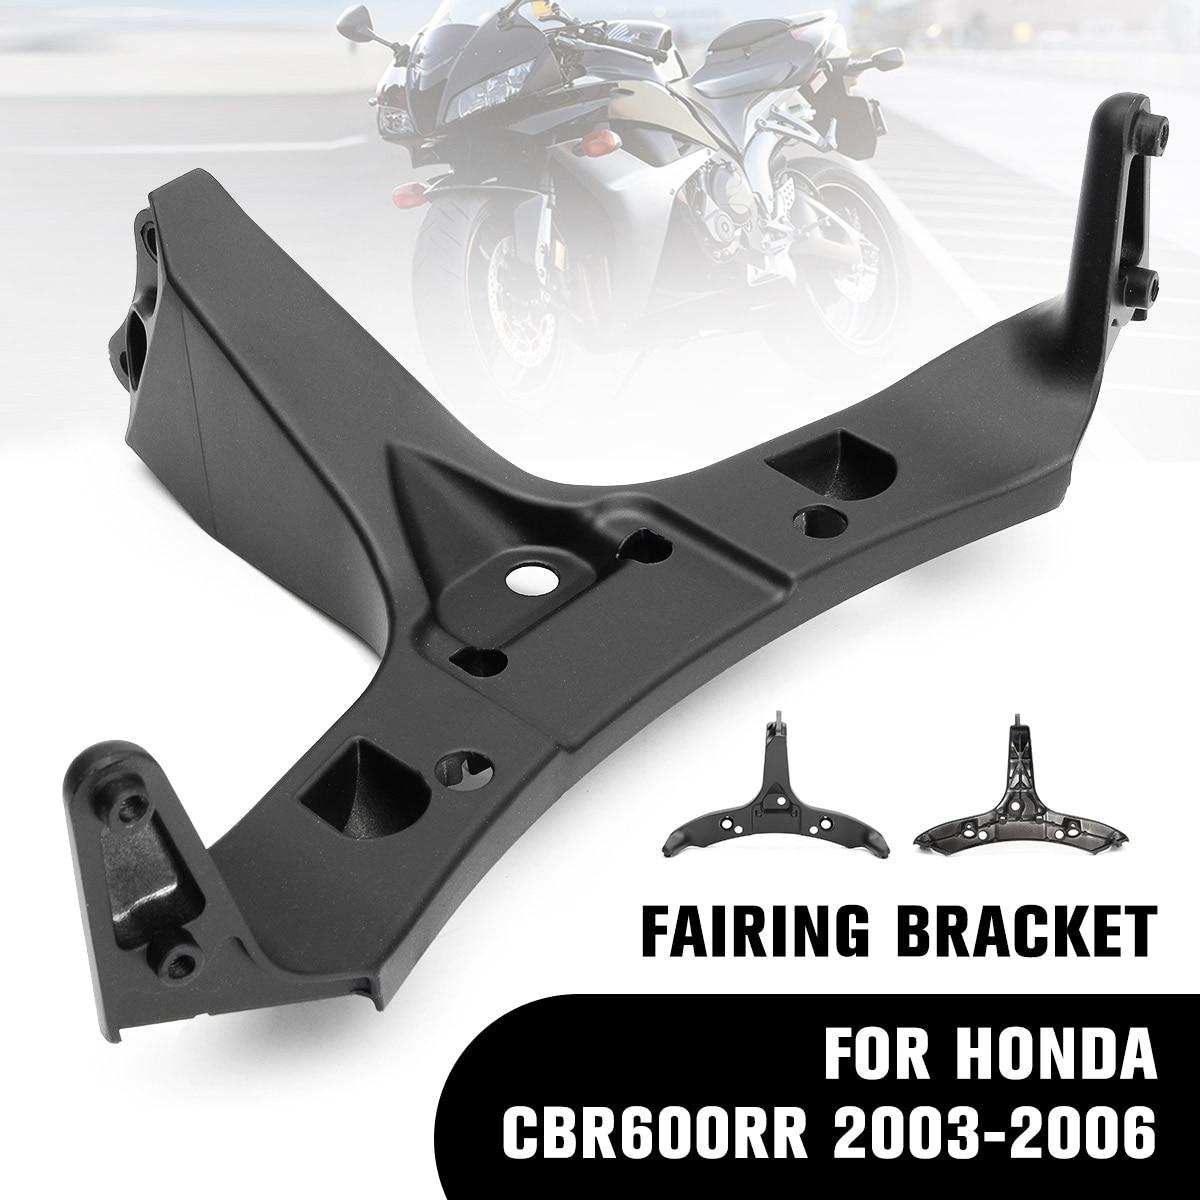 Upper Stay Fairing Cowling Headlight Bracket For Honda CBR600RR 2003-2006 F5